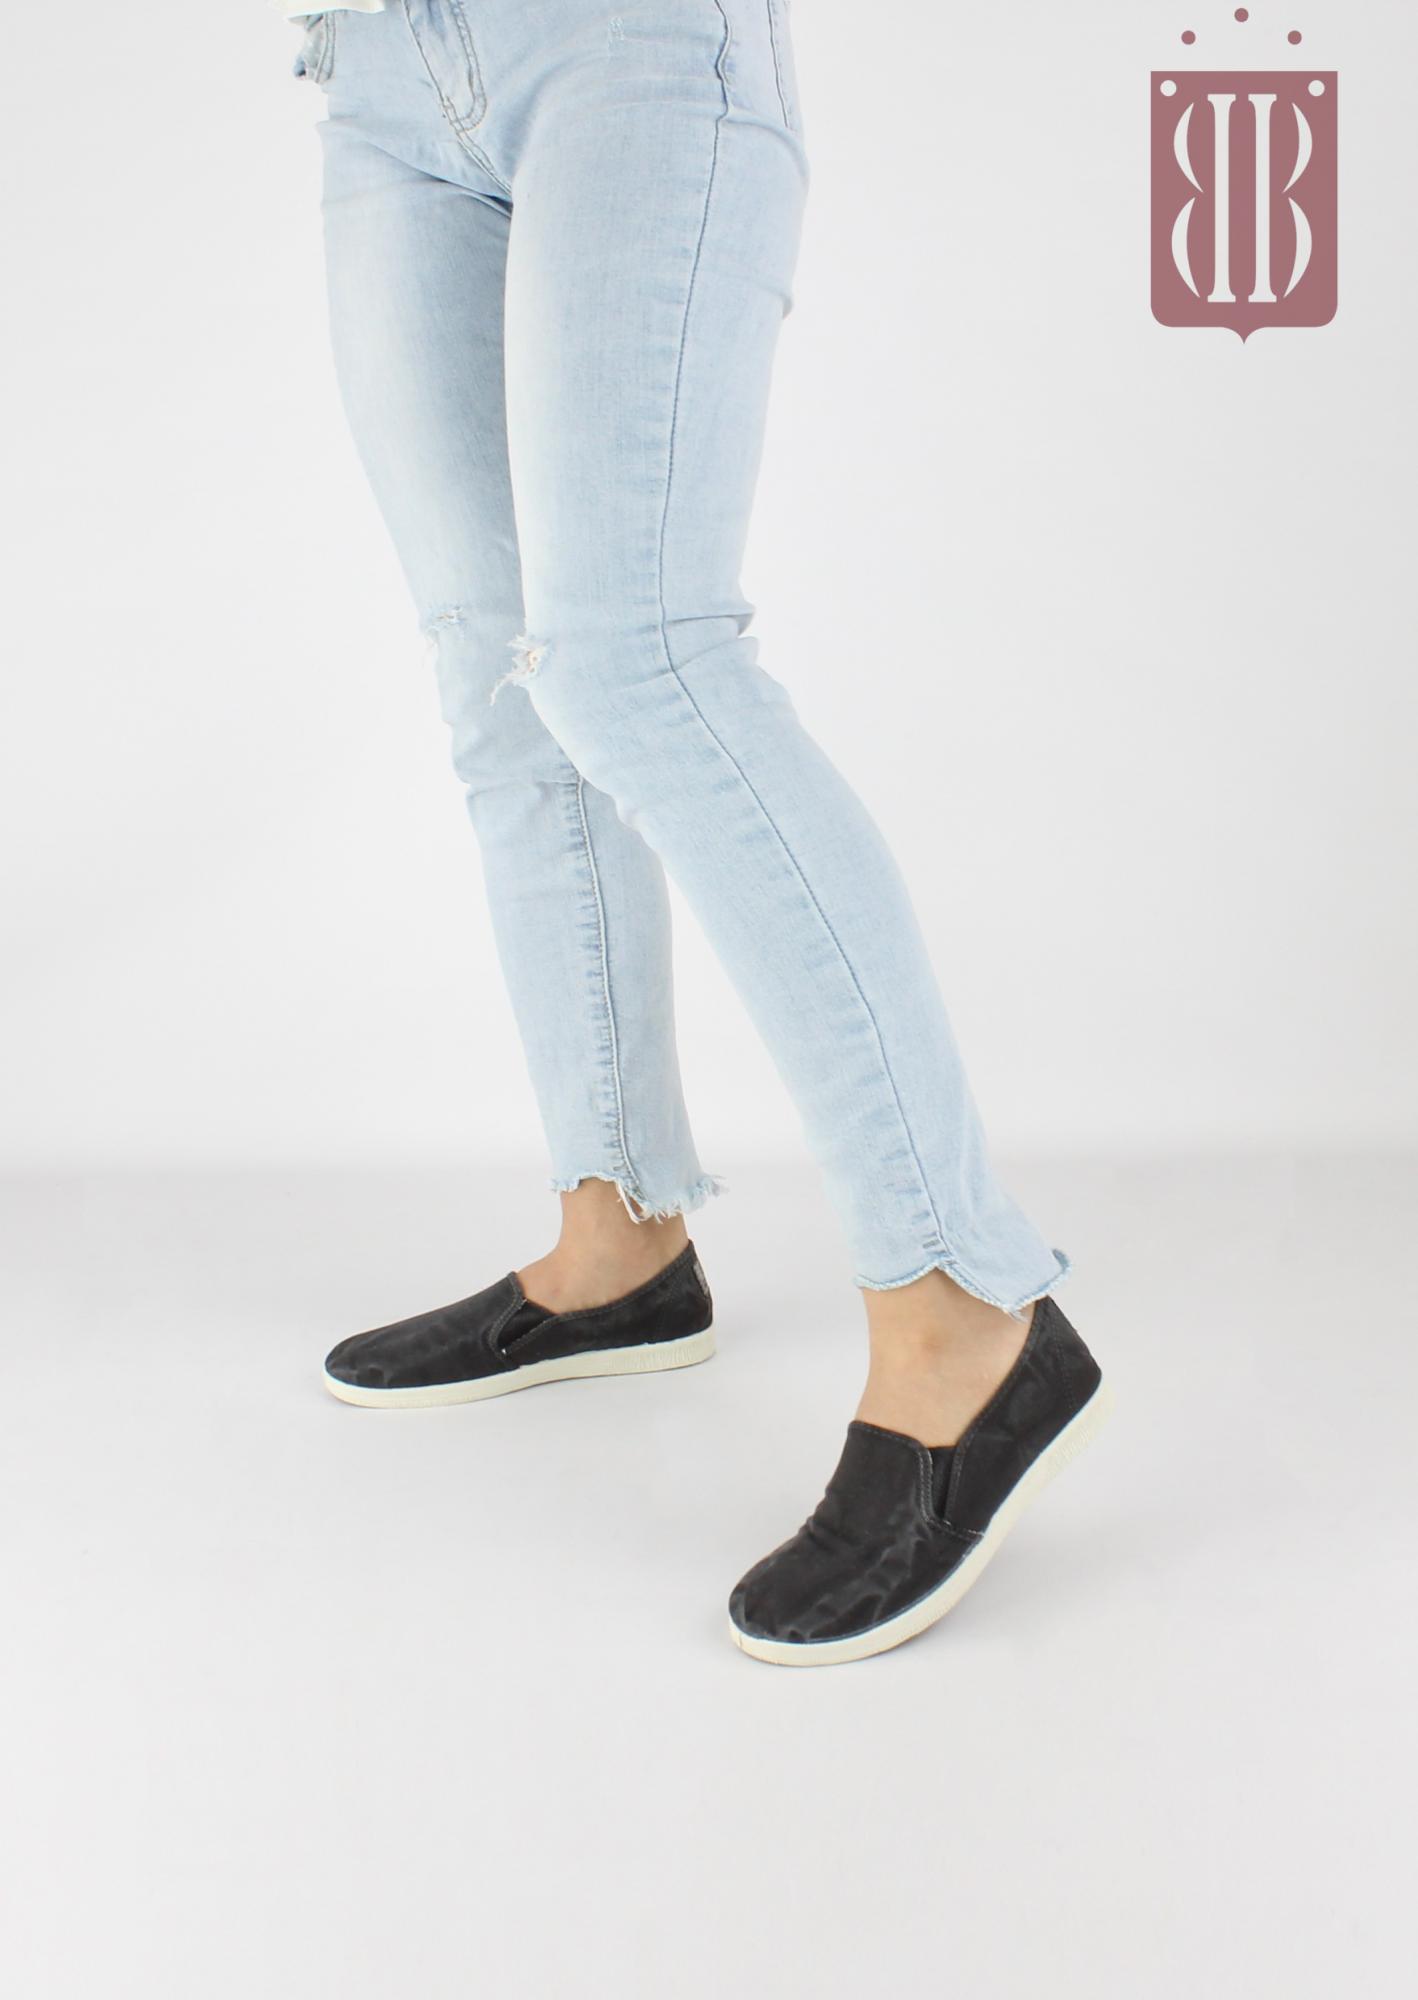 c183c101c1 NATURAL WORLD scarpe Donna Slip on Elastico Cotone Bio plantare estraibile  vegan shoes